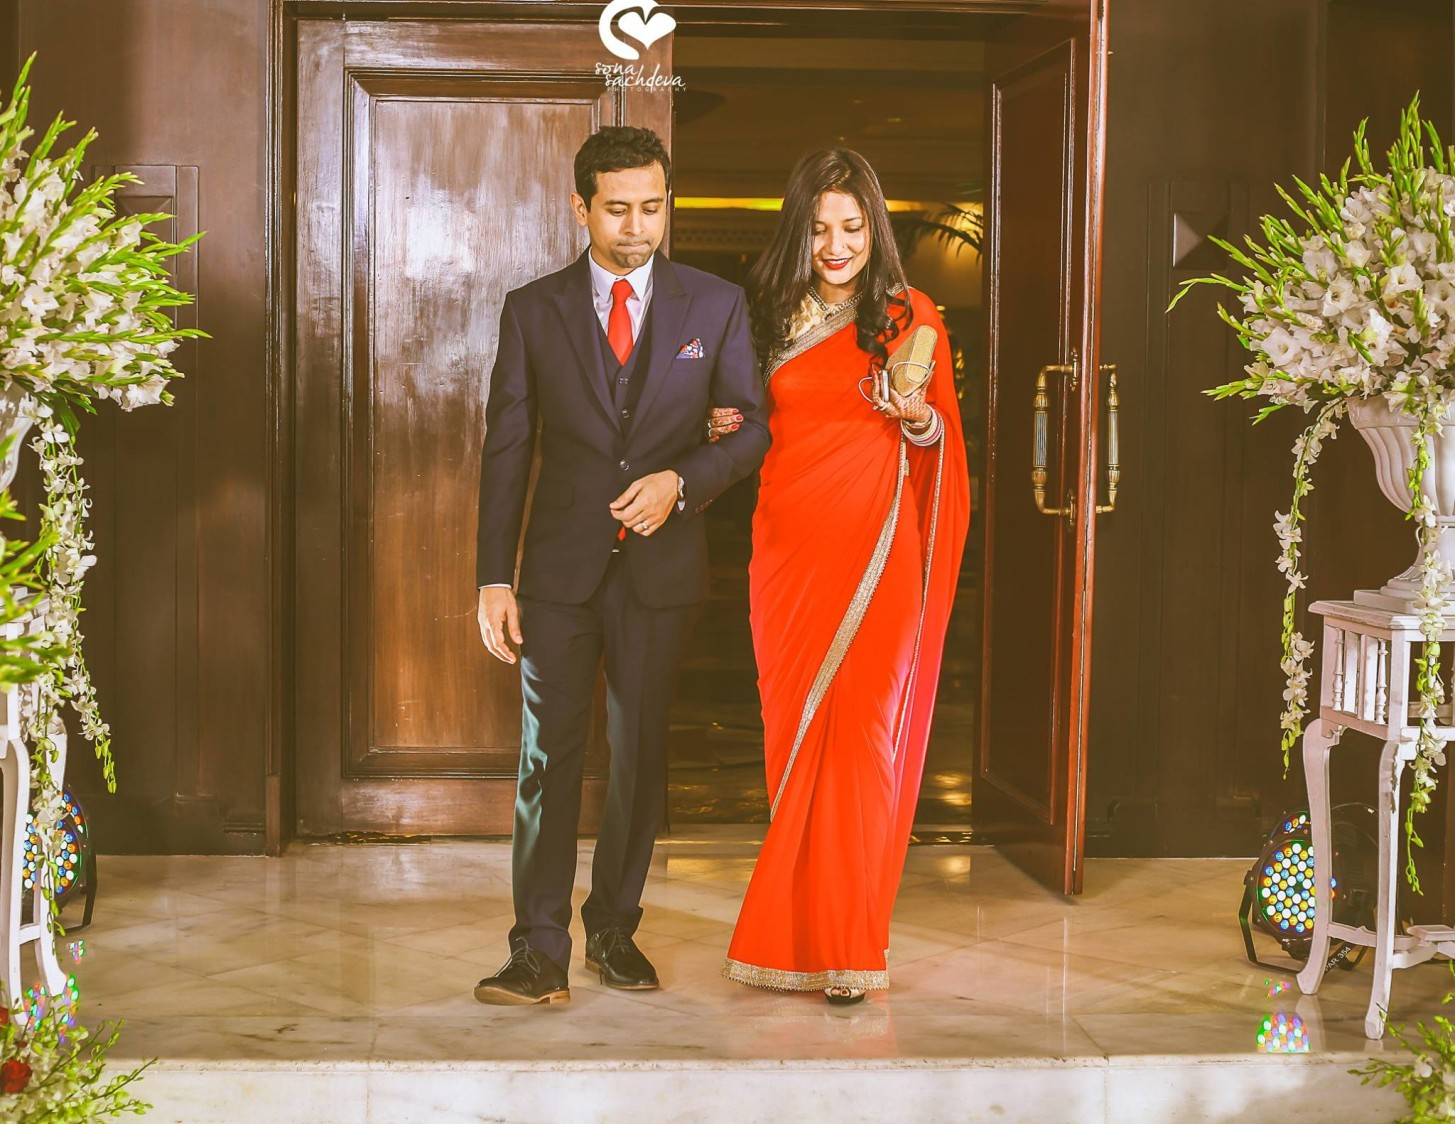 Prince charming and his princess incoming by Sona Sachdeva Photography Wedding-photography | Weddings Photos & Ideas